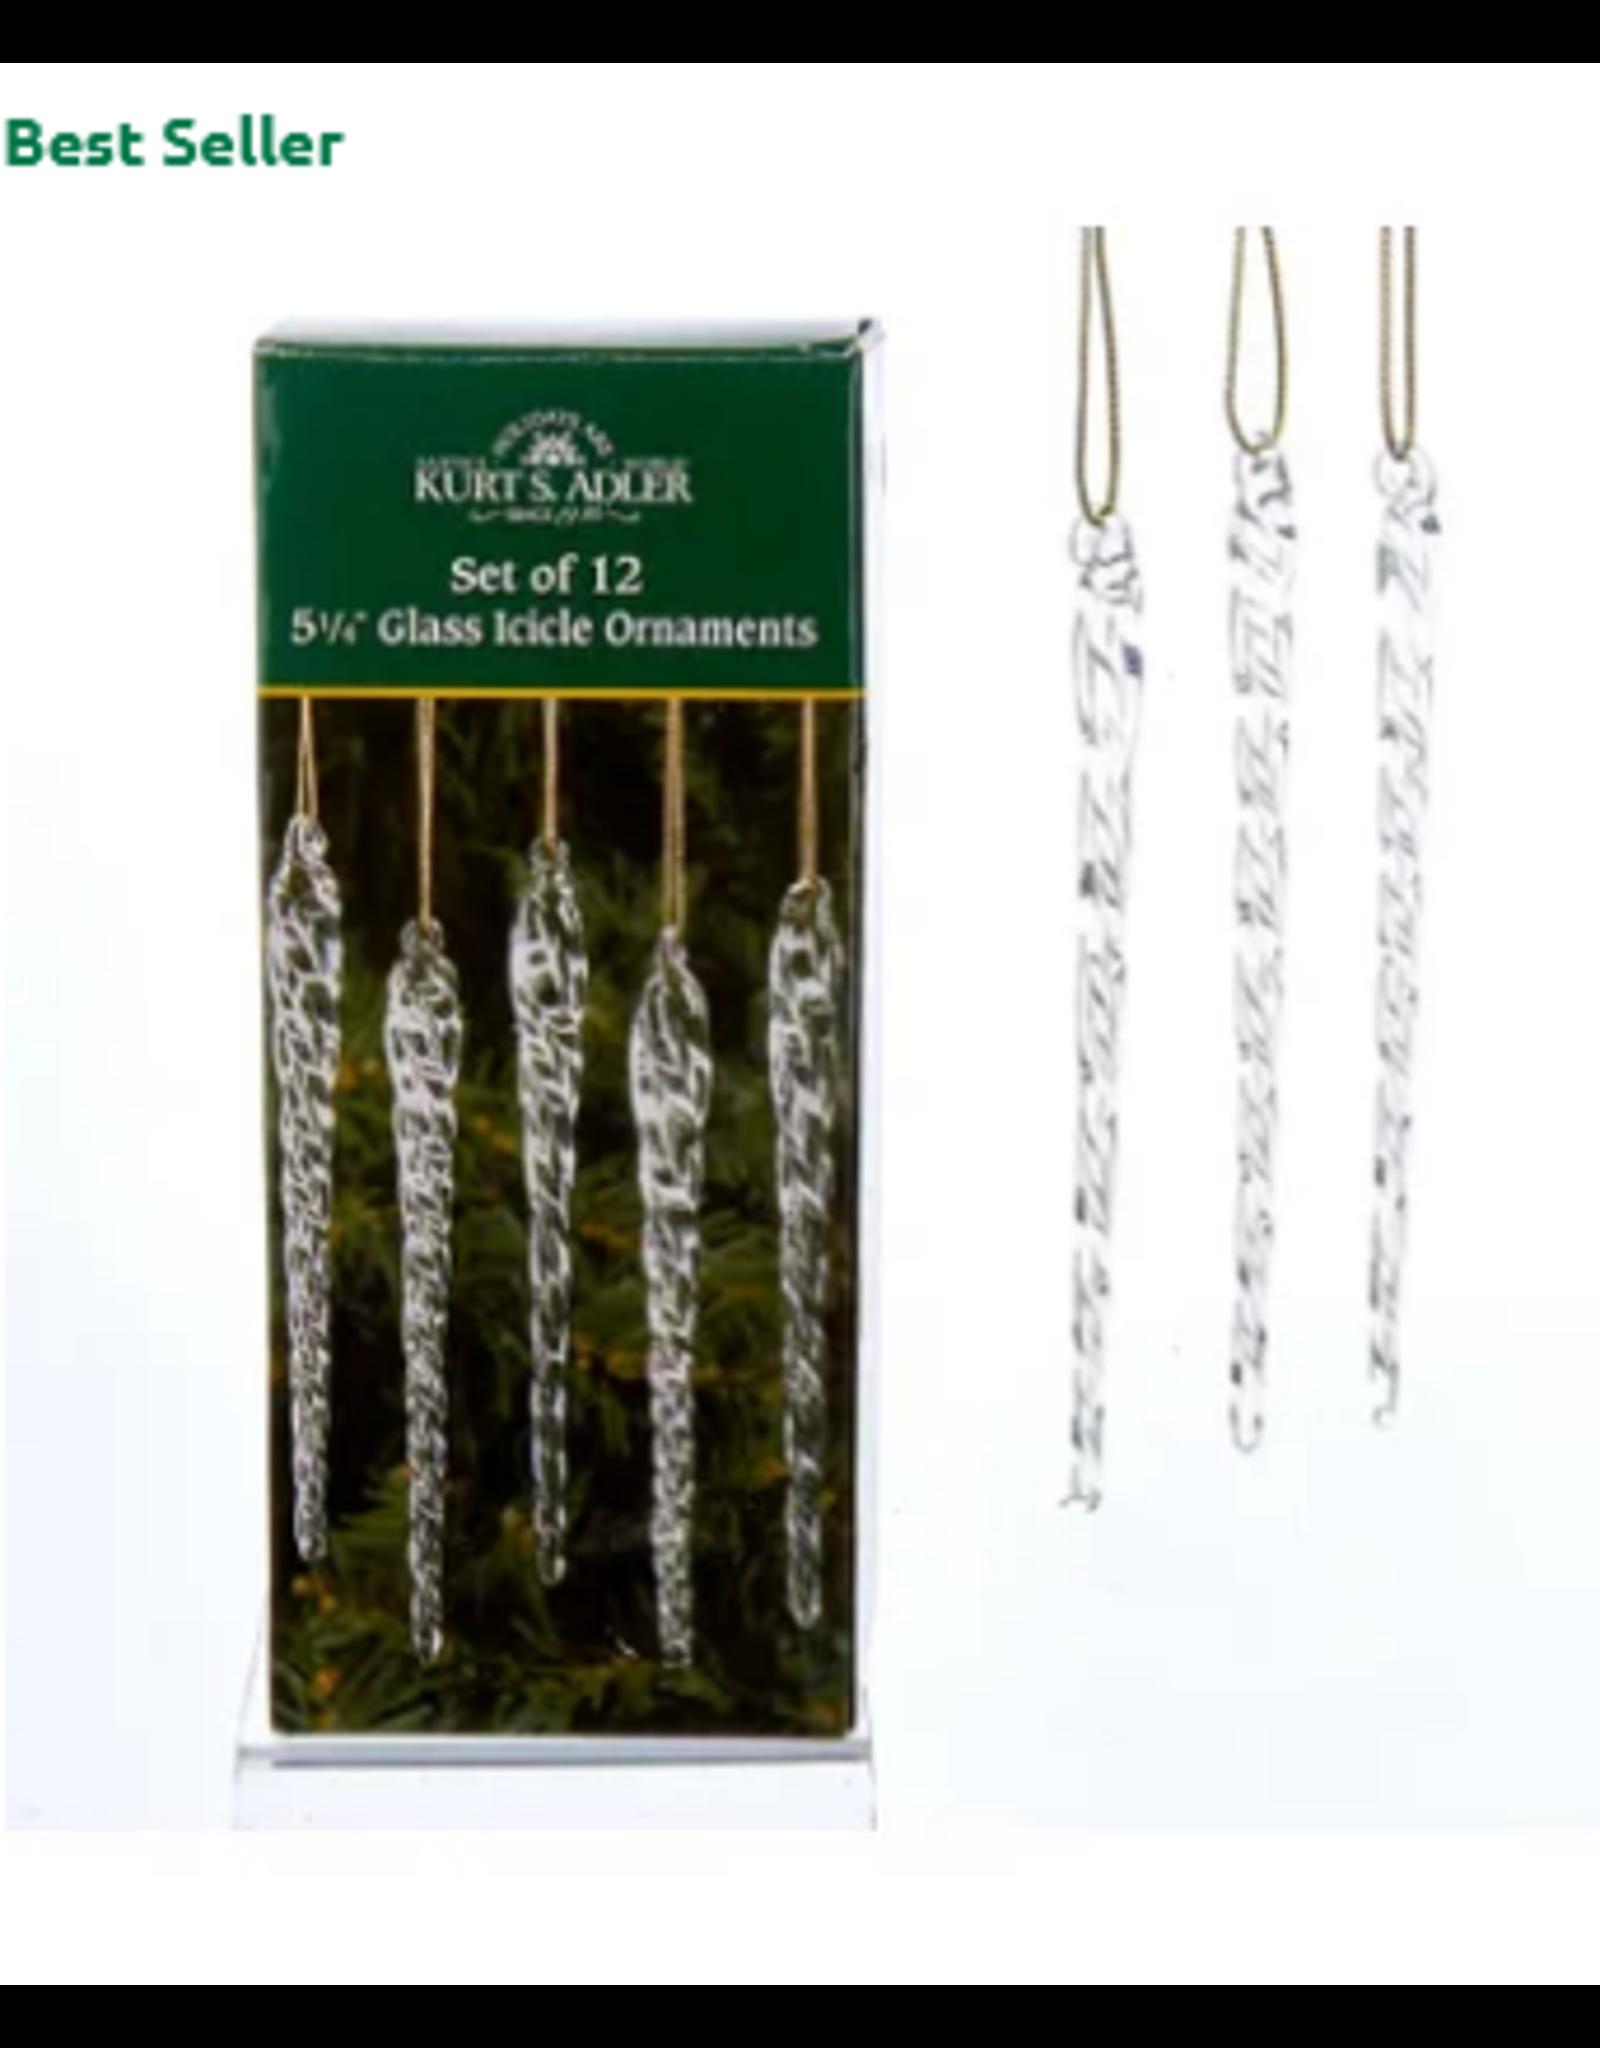 Kurt S. Adler Glass Icicles 12/Box